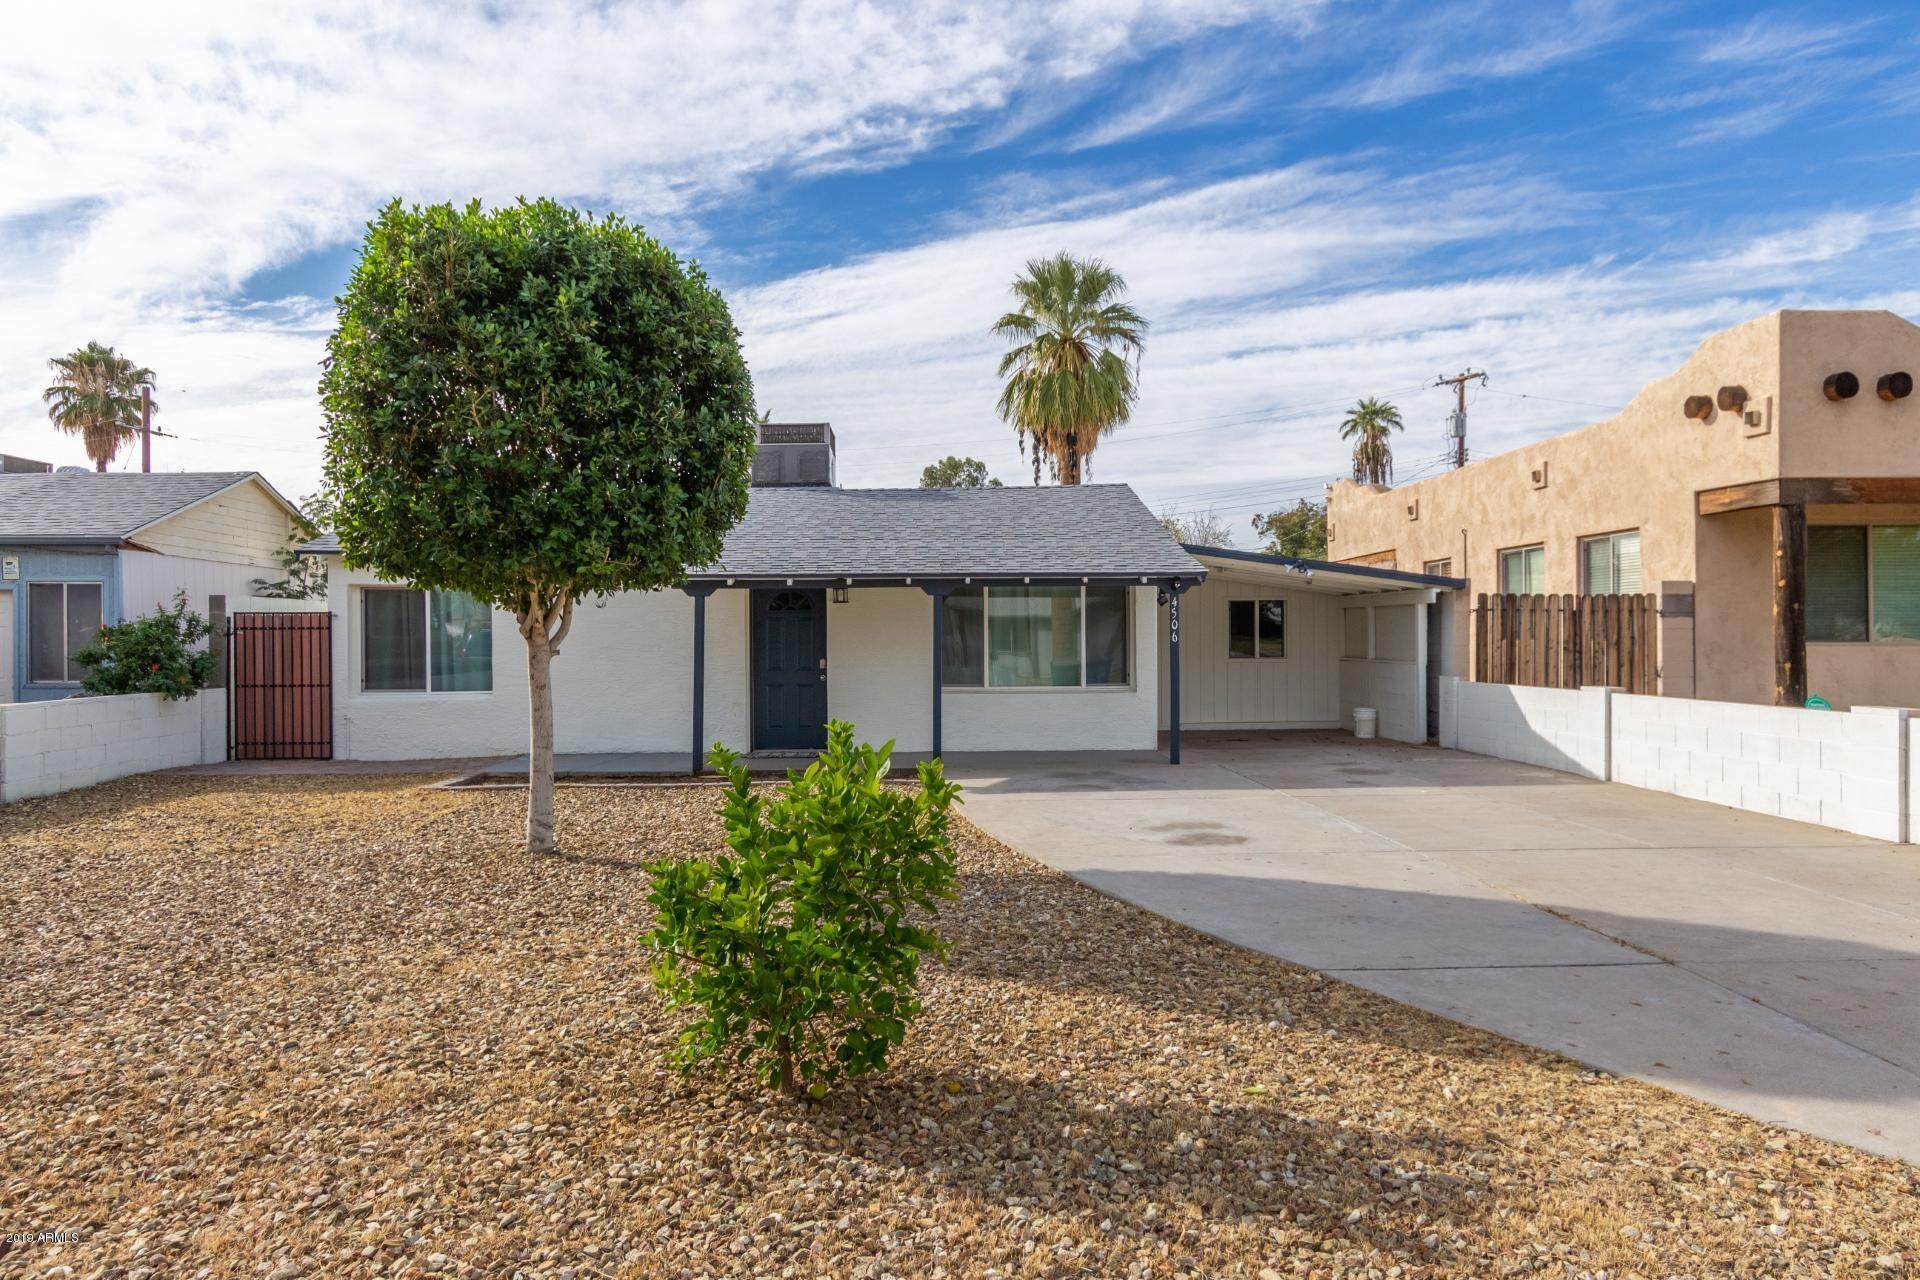 4506 N 14TH Street, Phoenix, AZ 85014 - MLS#: 6096105